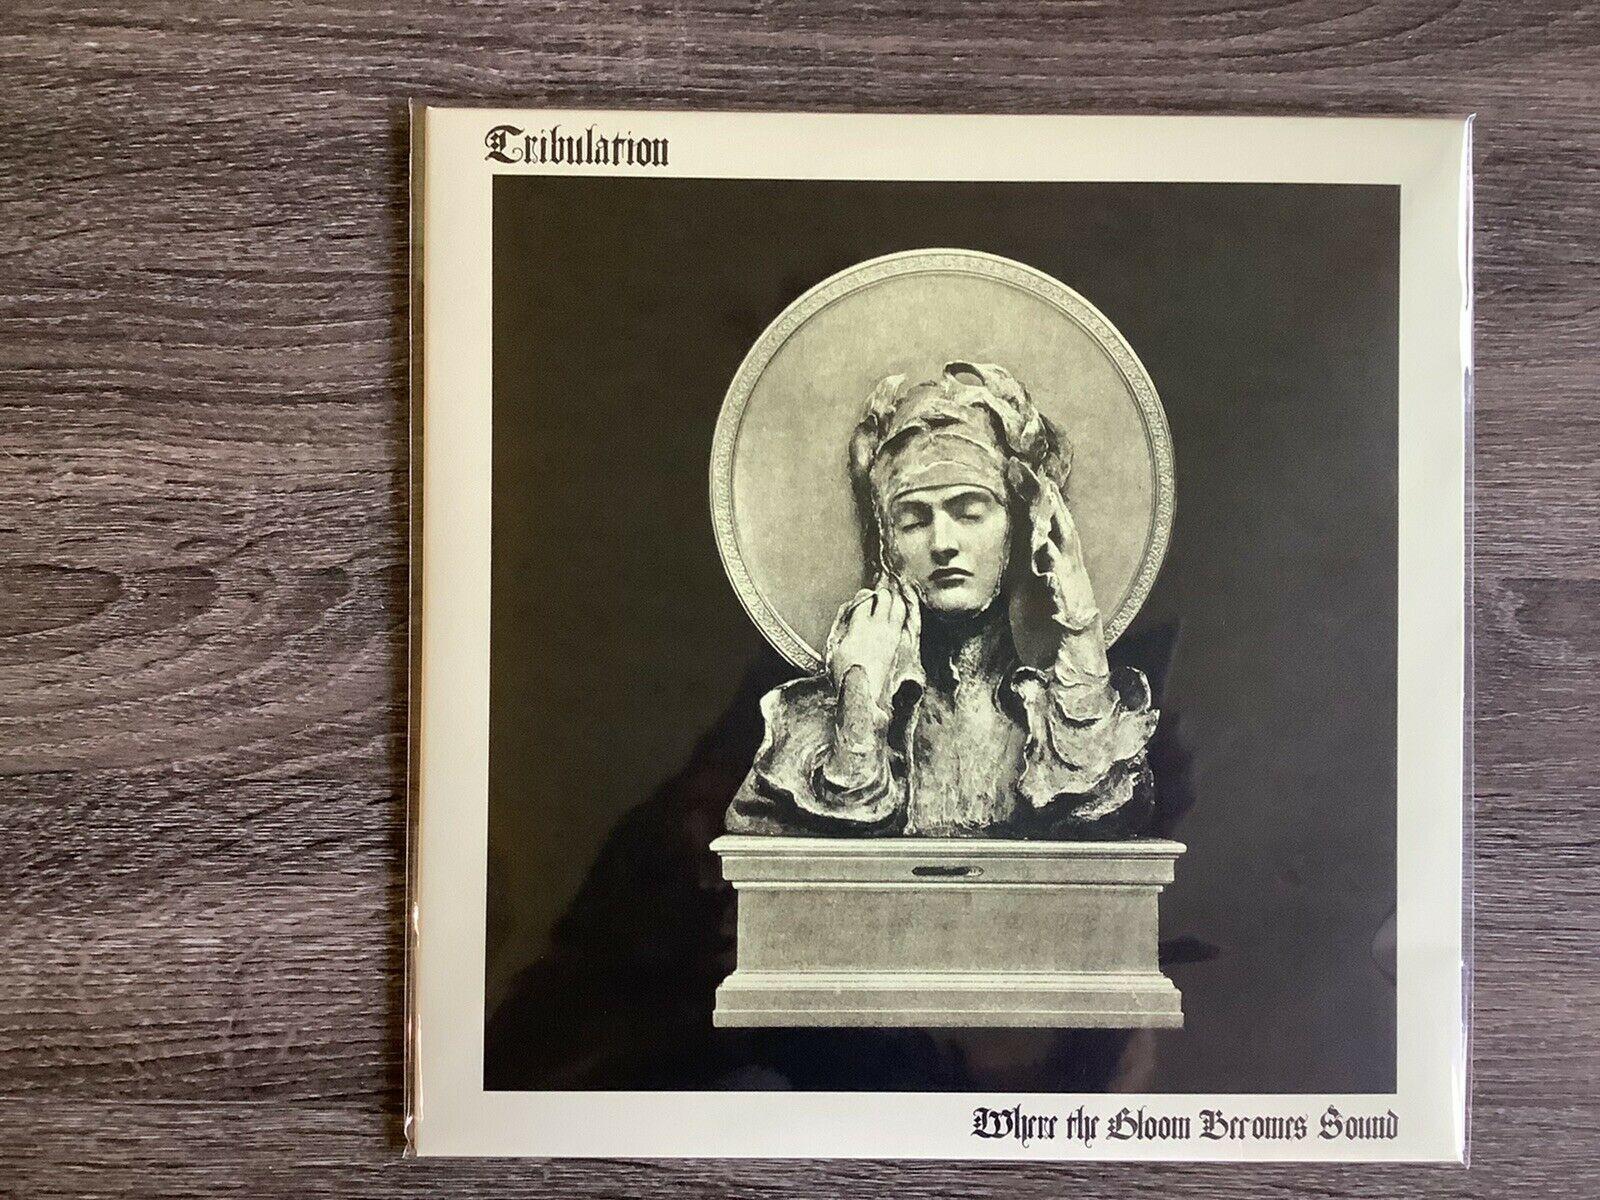 Tribulation Where The Gloom Becomes Sound Vinyl LP